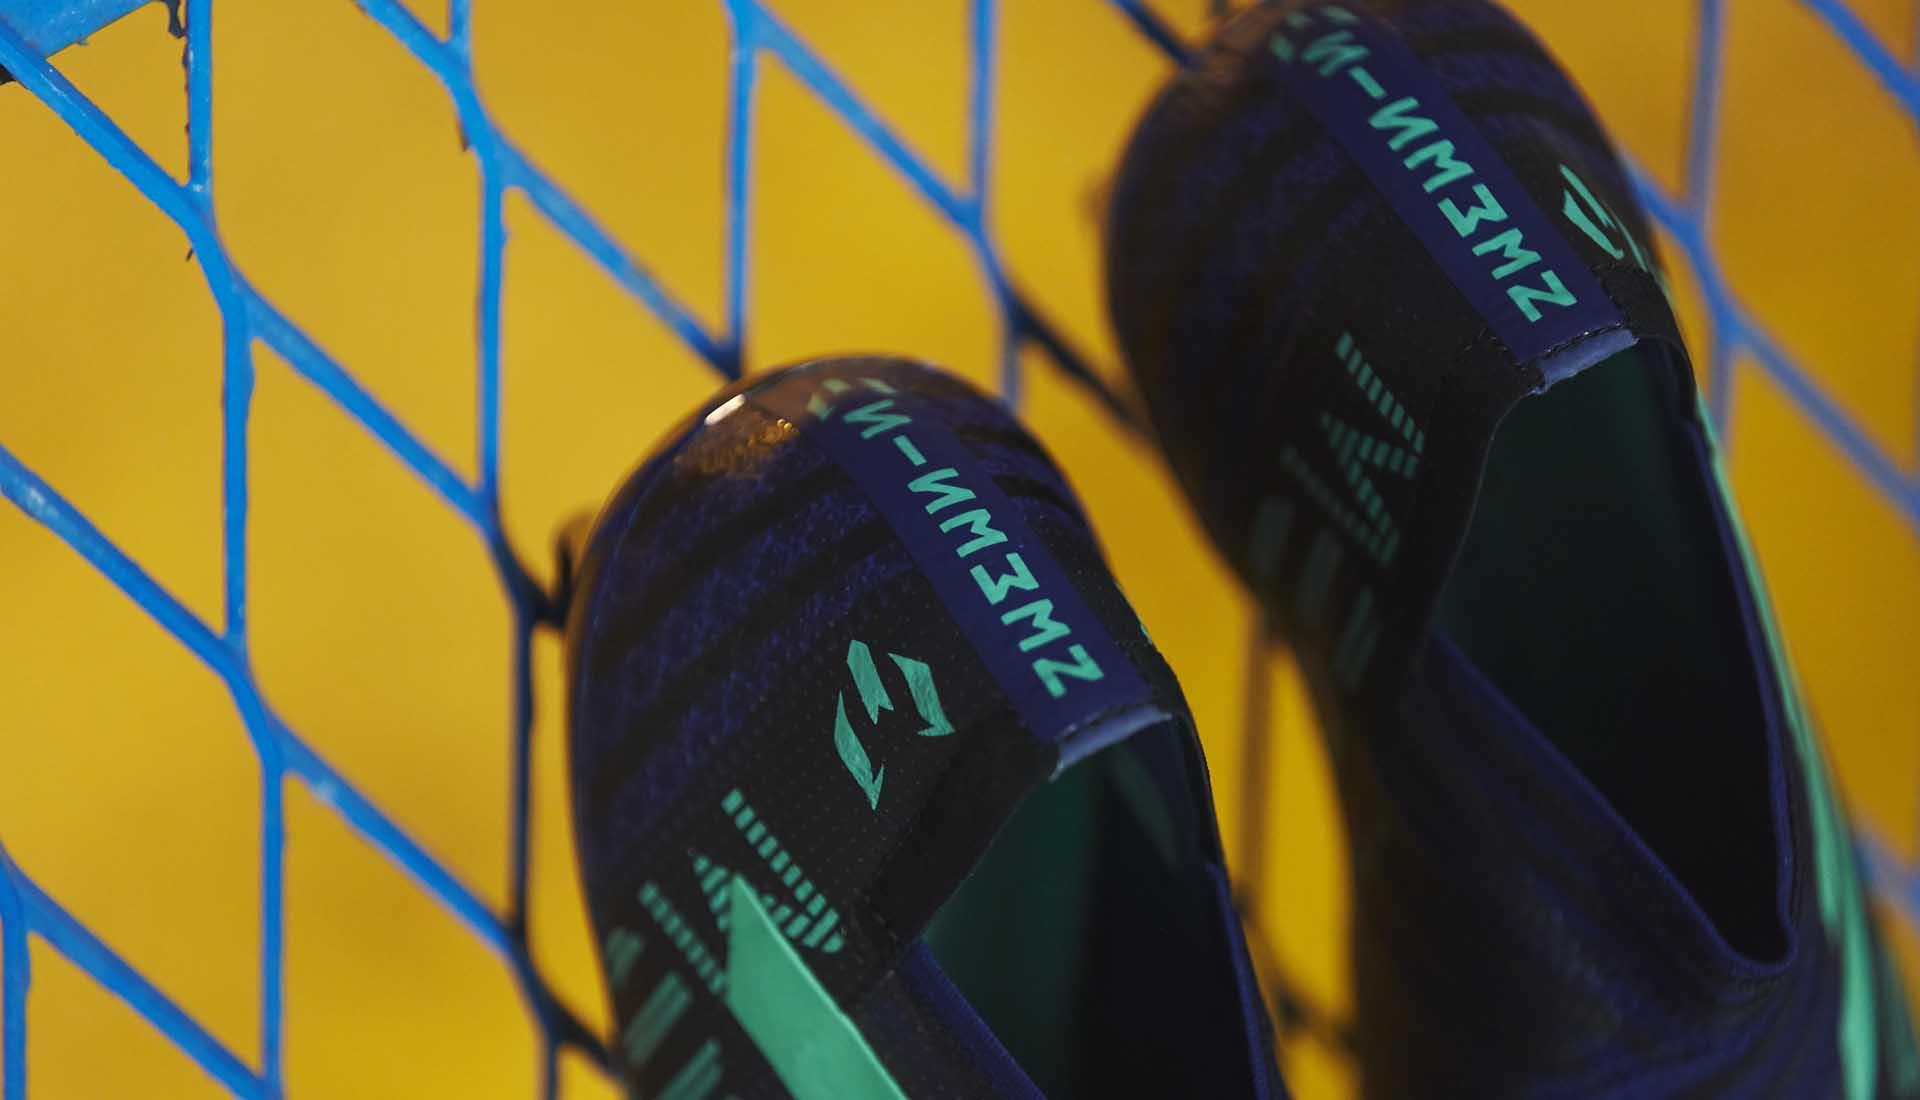 66bf00abea8 adidas Launch The Nemeziz Messi 17+